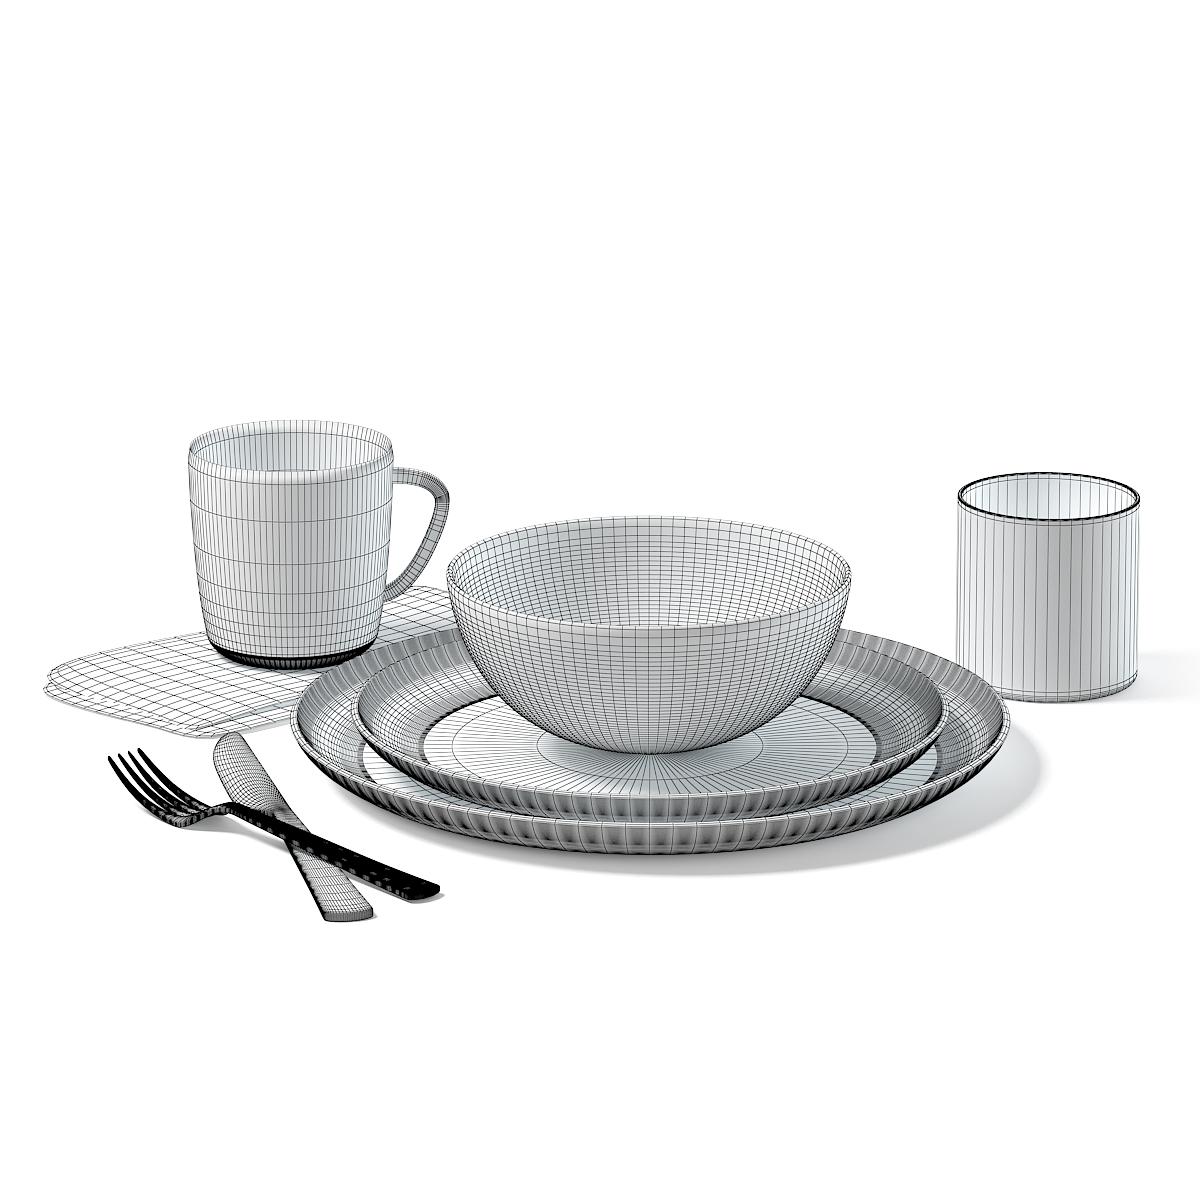 Dishes Set 3D Model